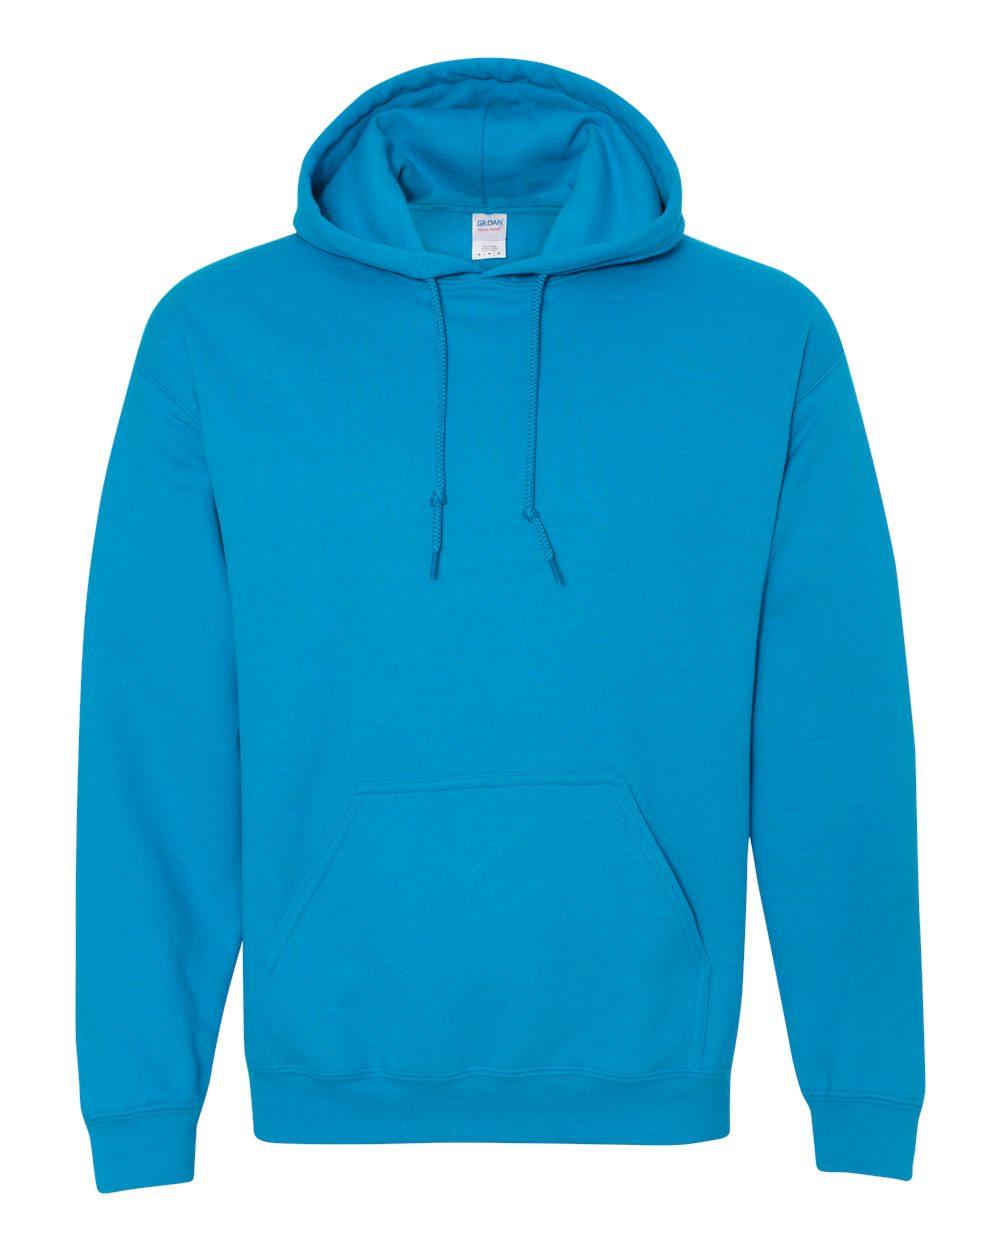 Gildan-Mens-Blank-Hoodie-Heavy-Blend-Hooded-Sweatshirt-Solid-18500-up-to-5XL thumbnail 92